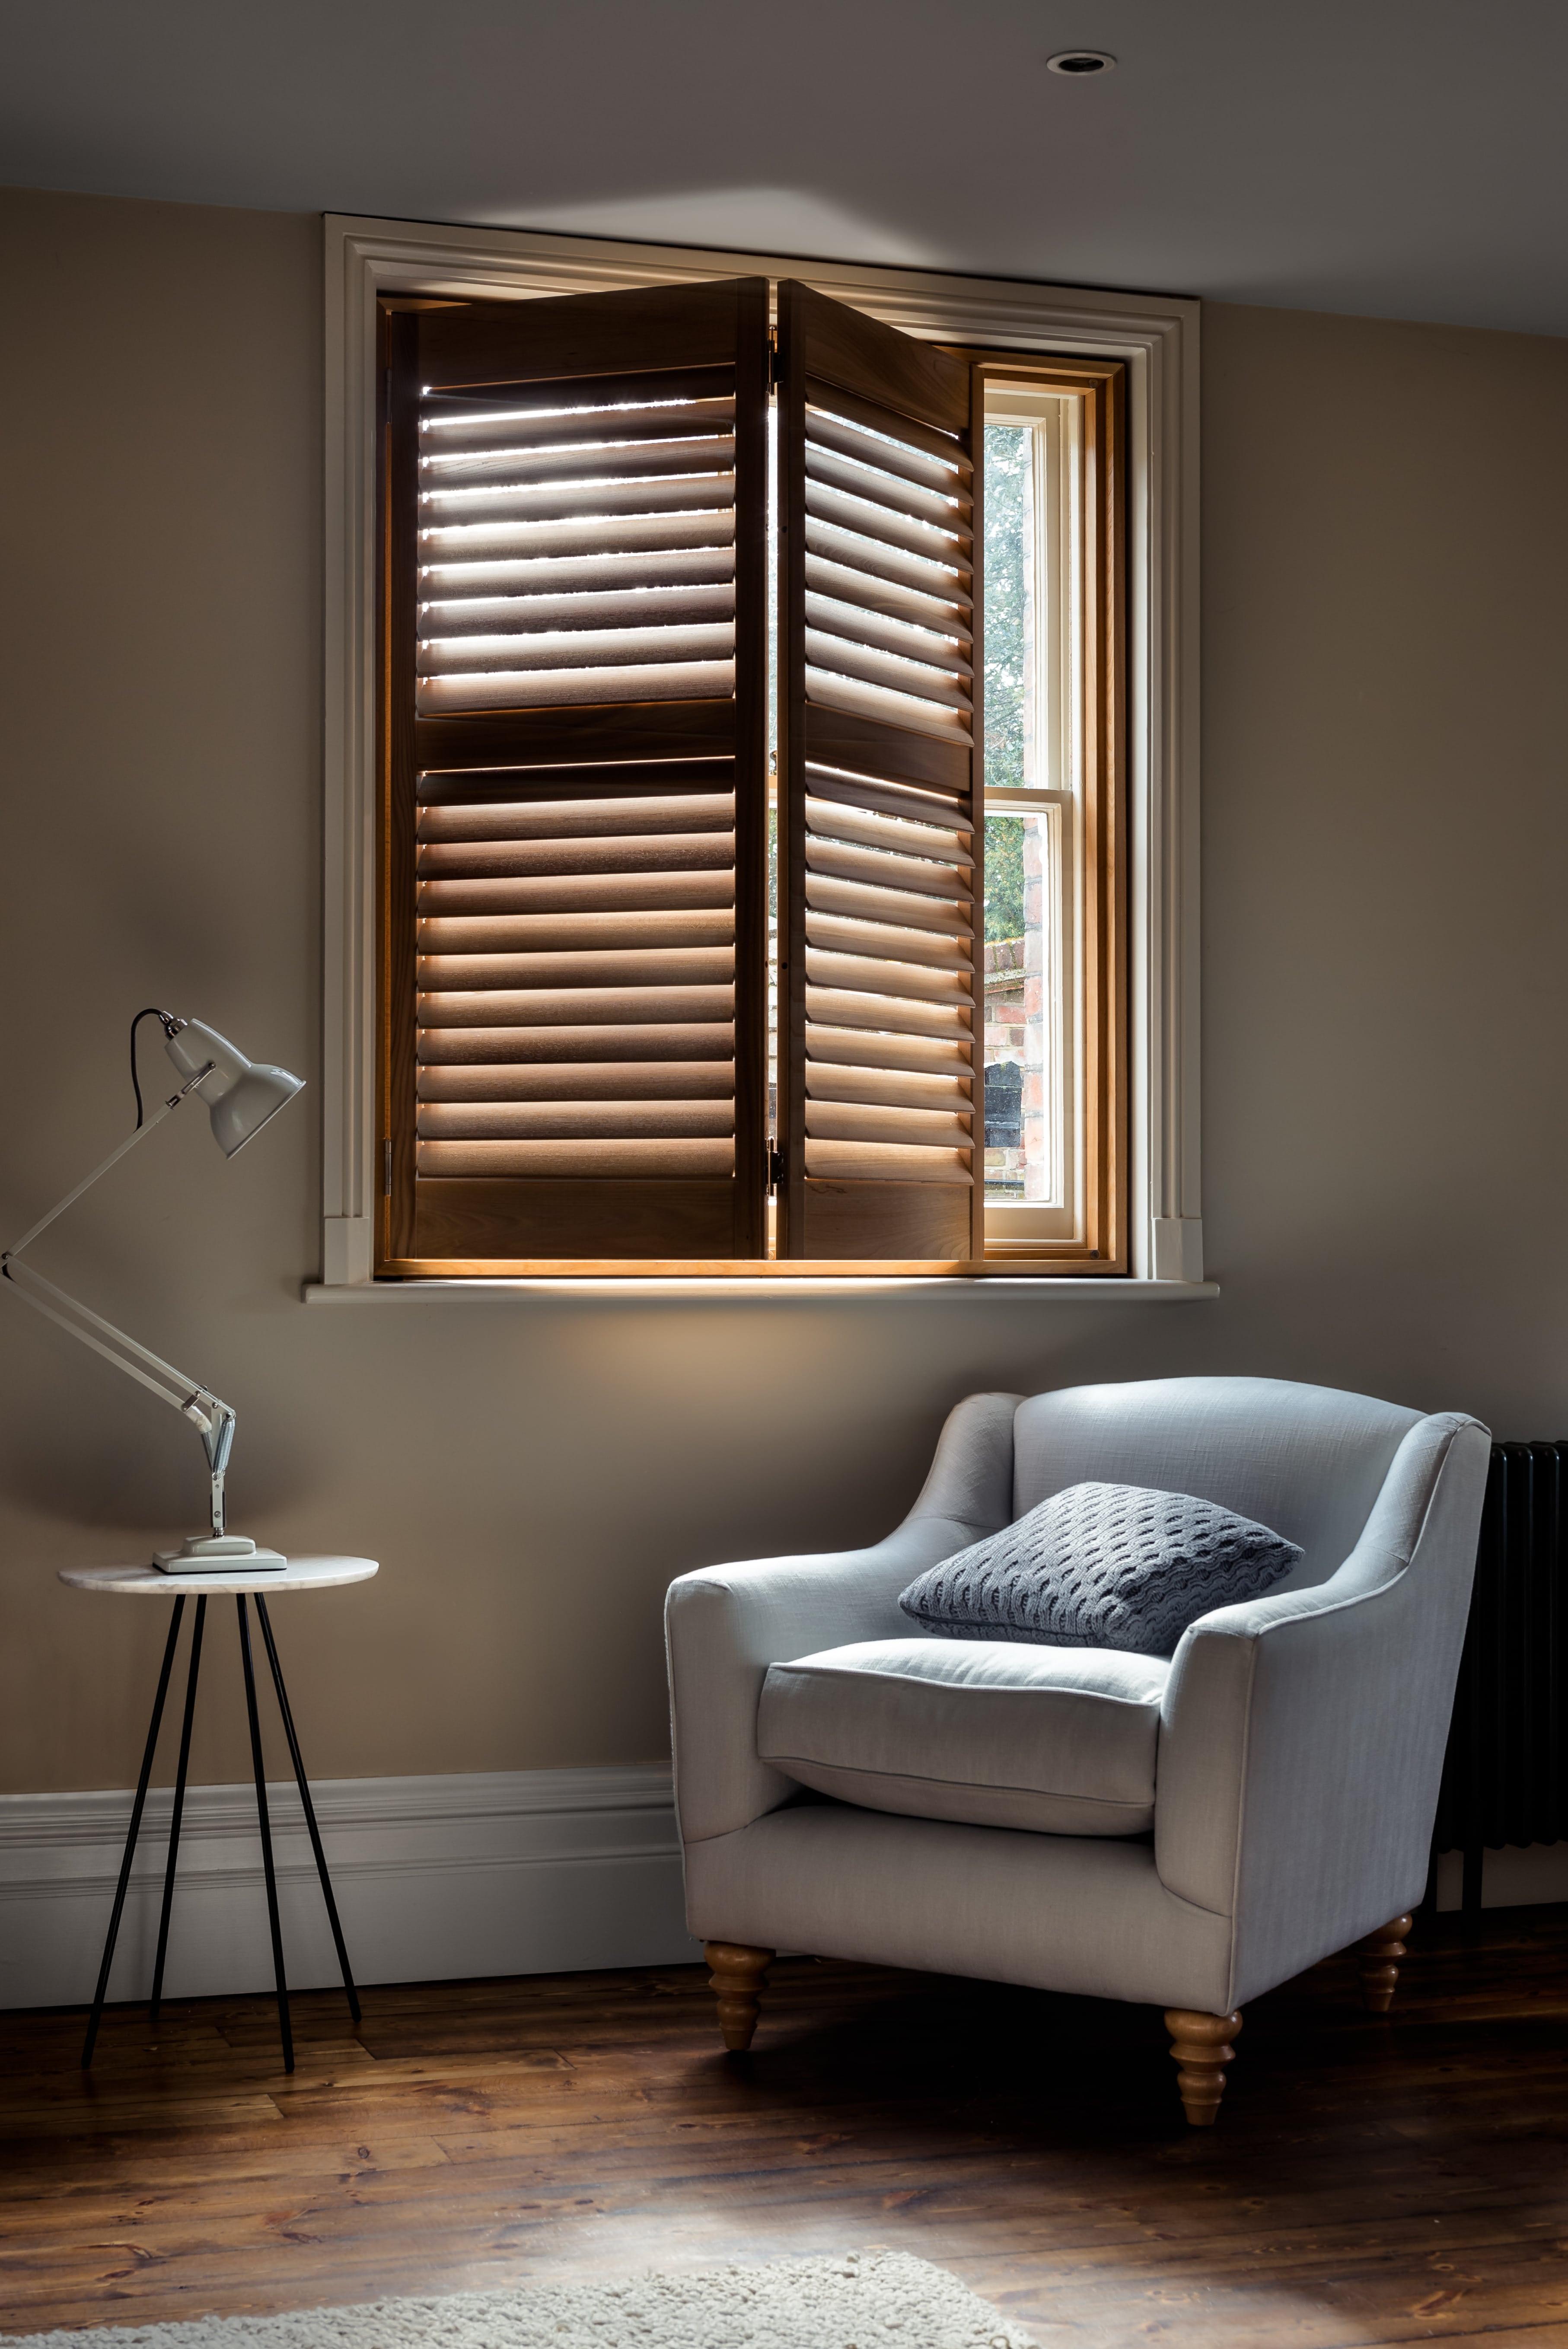 Rustic wood stain shutters by Shutterly Fabulous